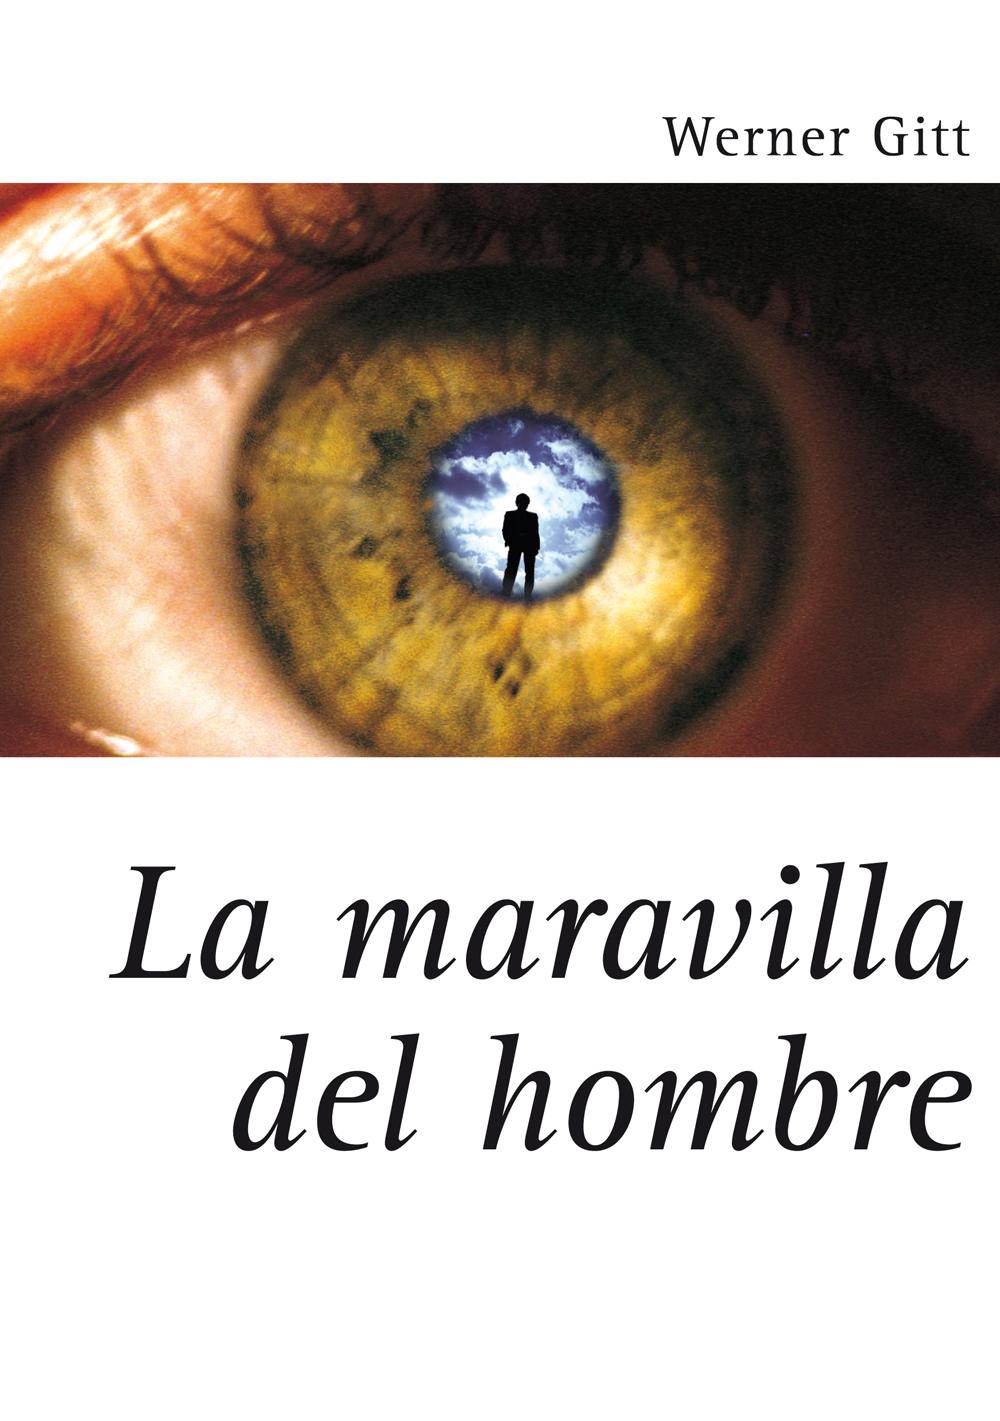 Spanisch: Faszination Mensch